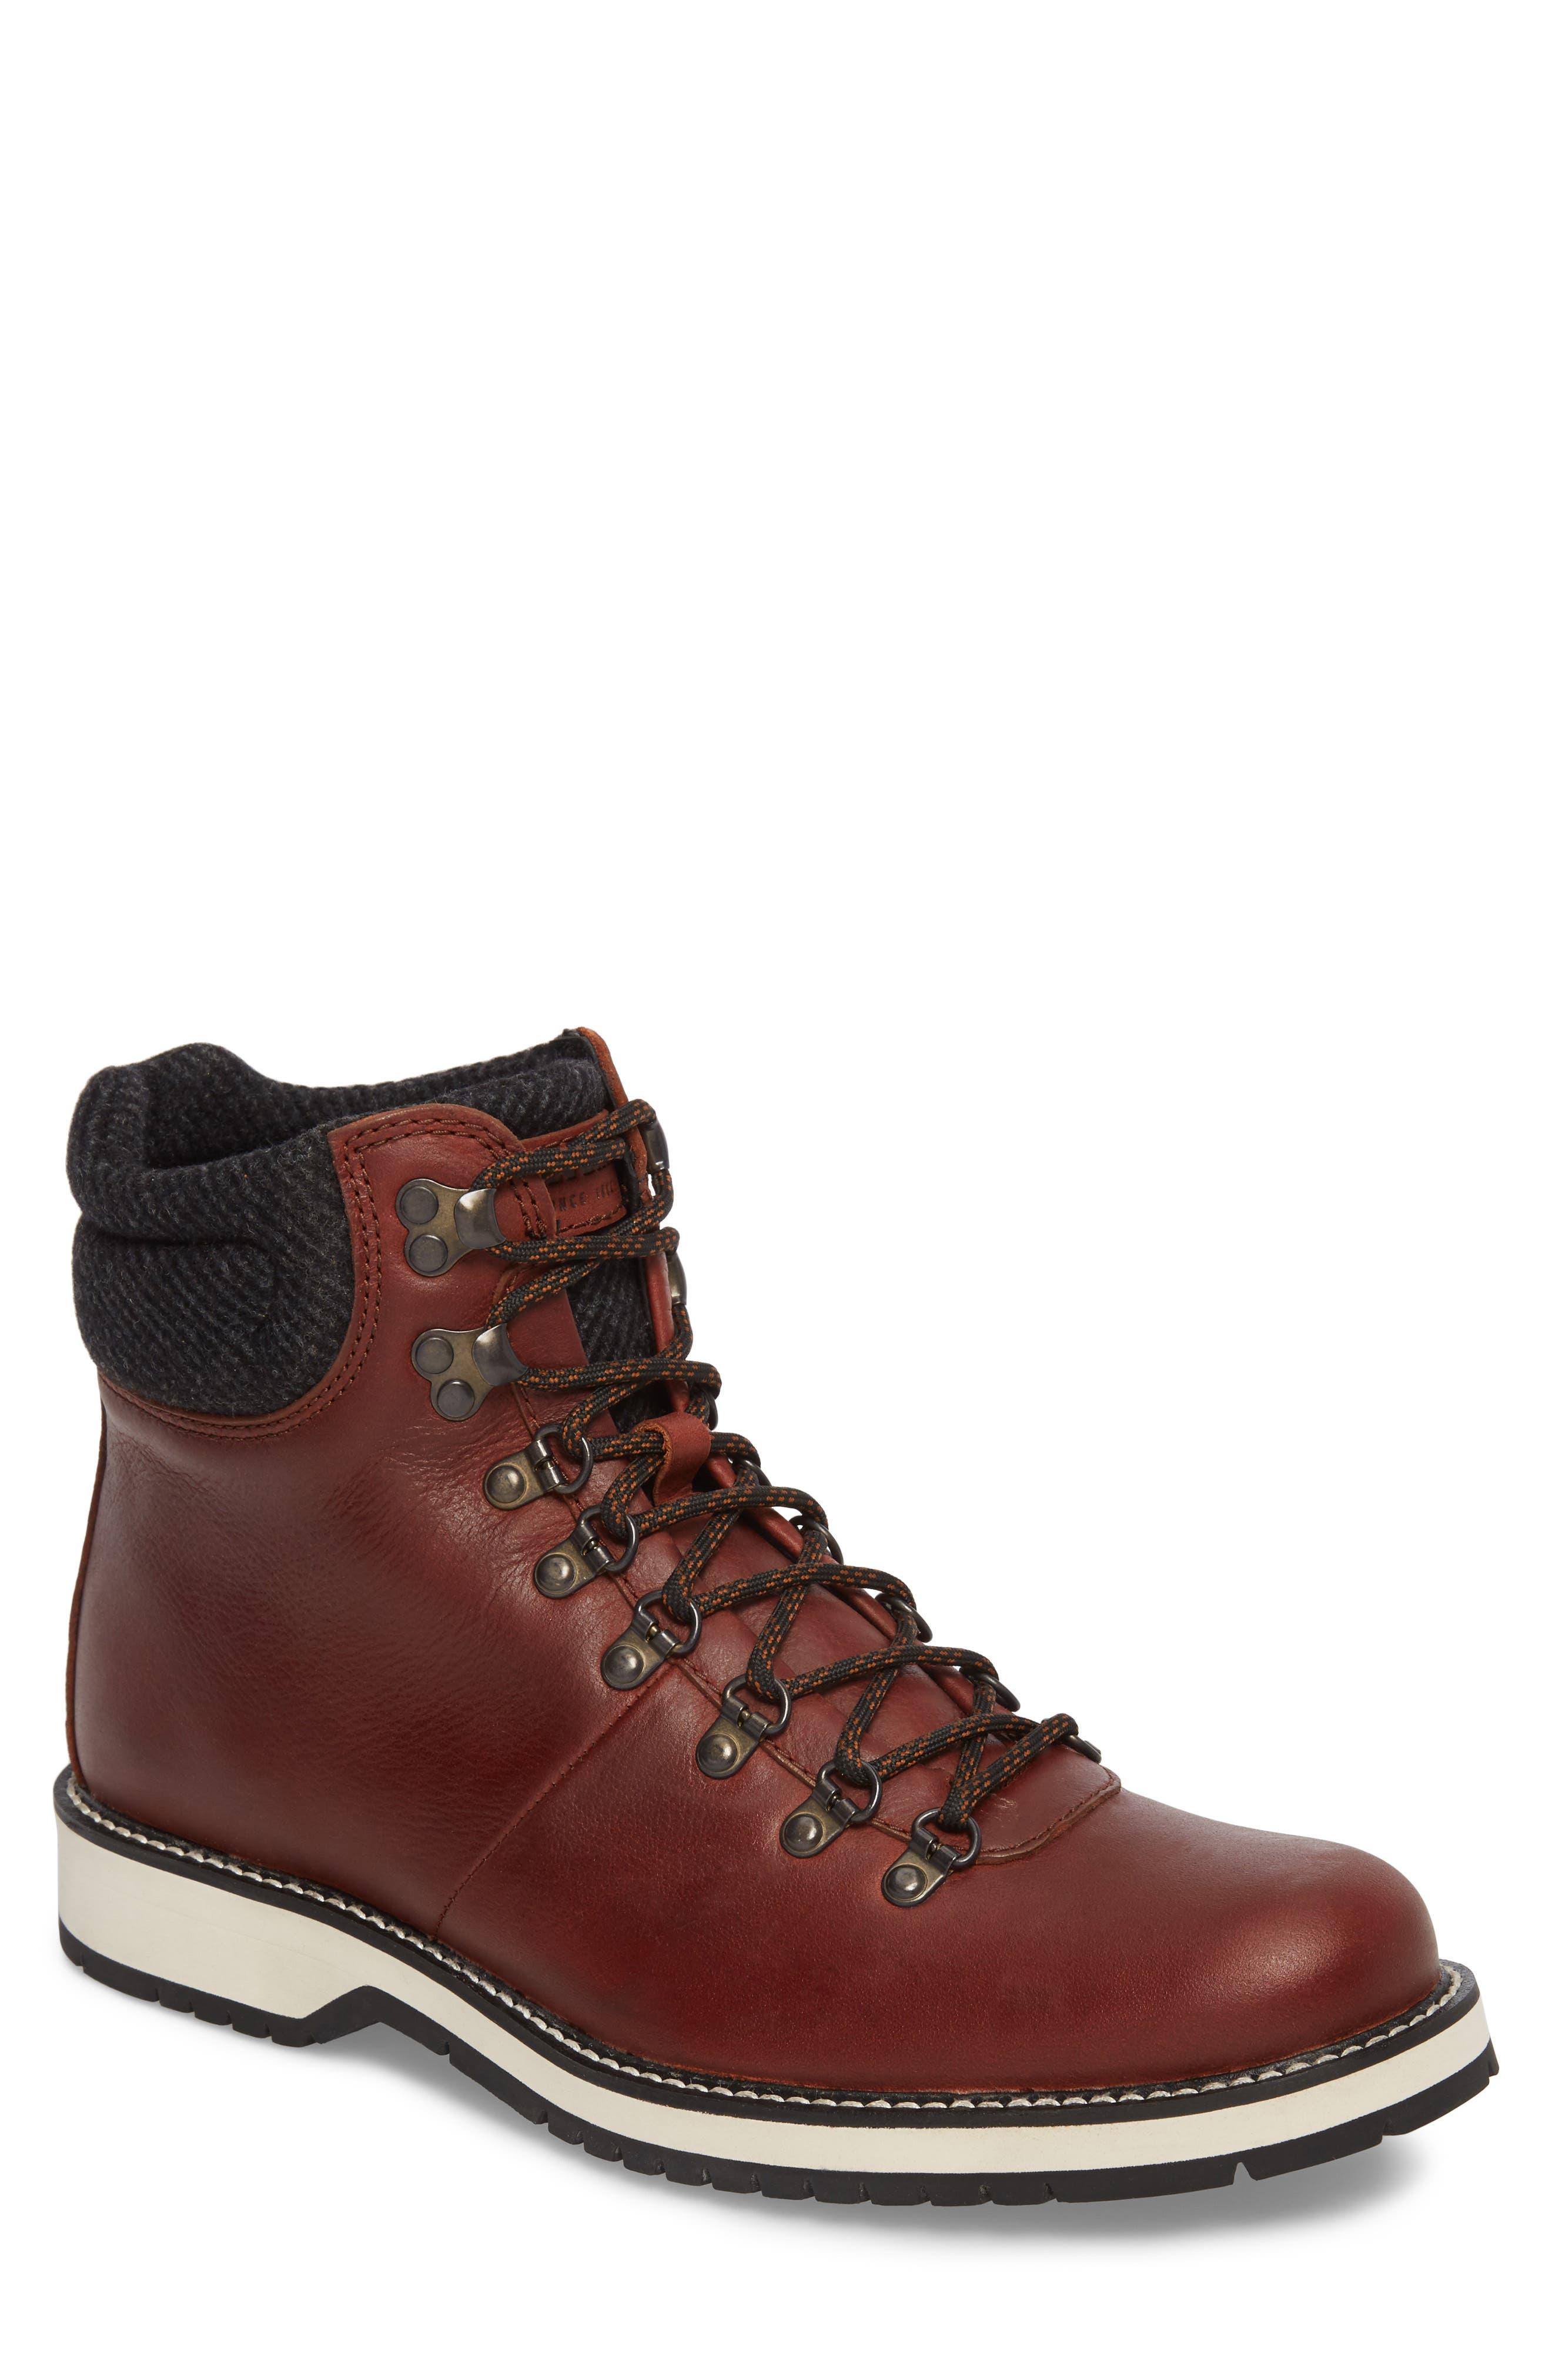 Sidney Waterproof Plain Toe Boot,                             Main thumbnail 1, color,                             Brown